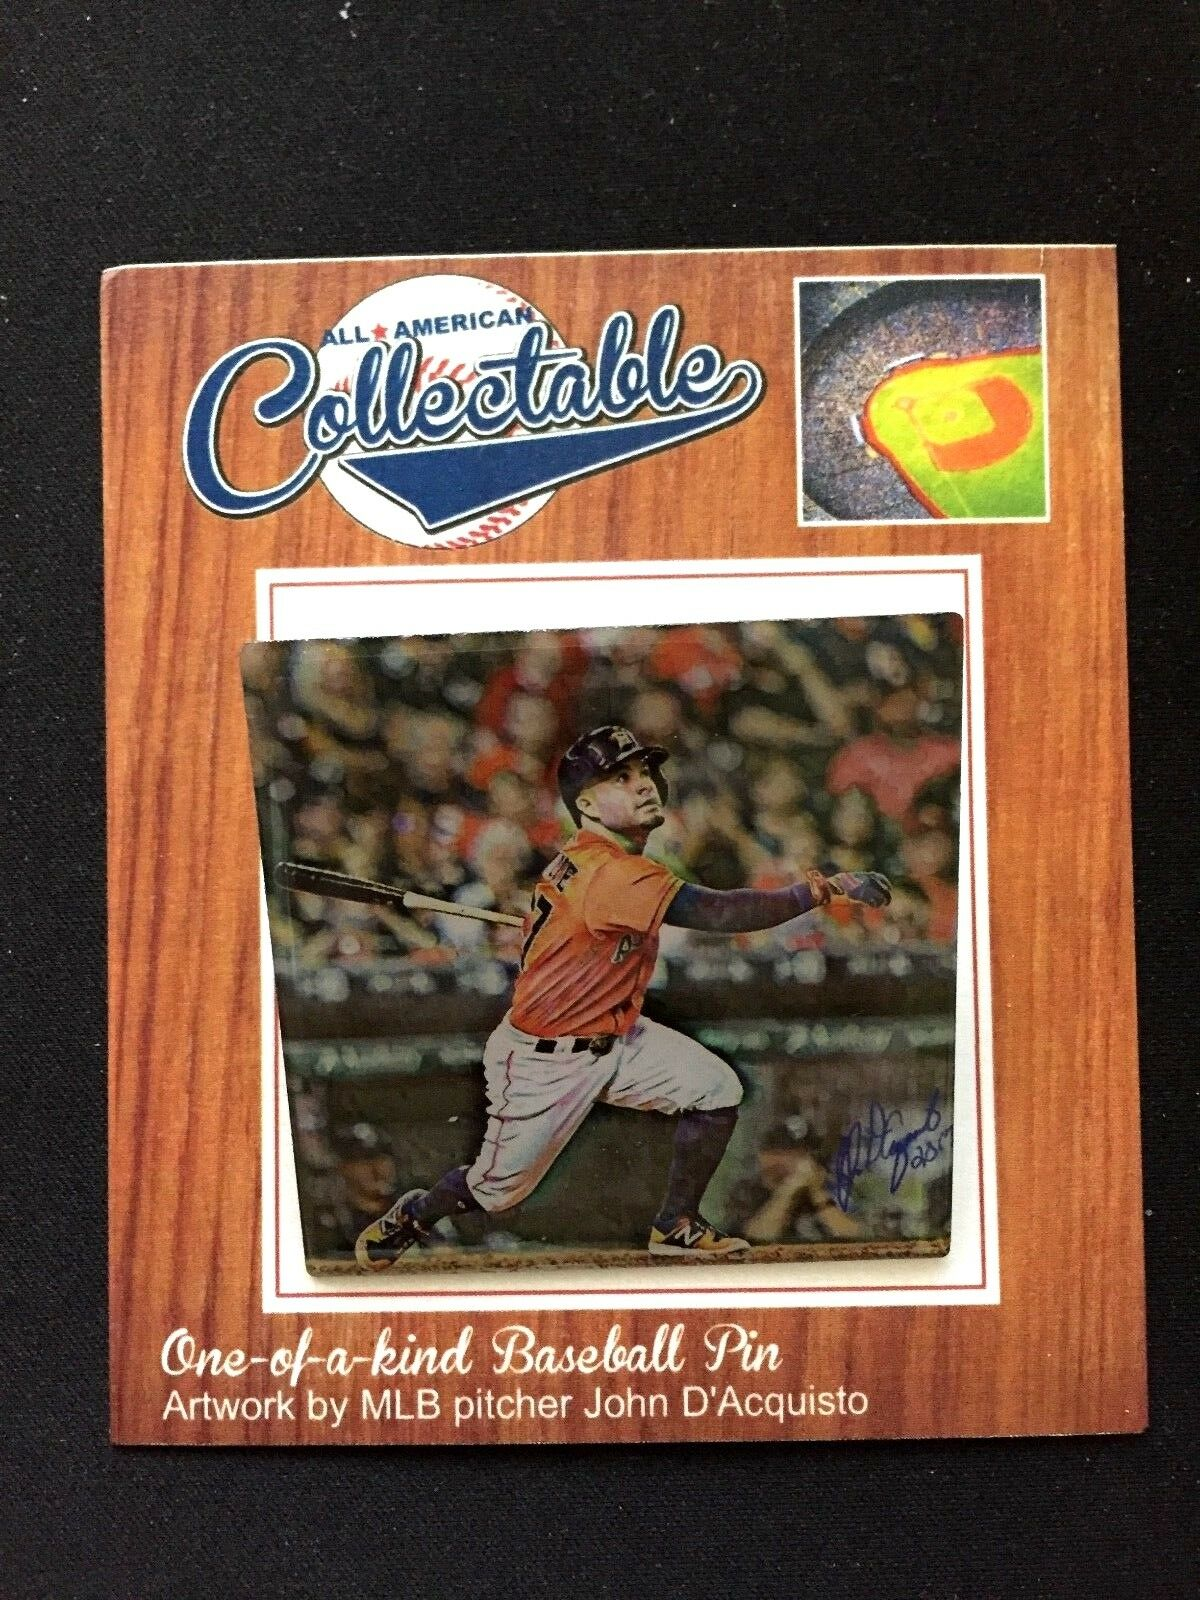 Houston Astros Jose Altuve Revers Pin-Retro Pin-Retro Pin-Retro Sammelobjekt Memories-Mvp   Ws 10faf0